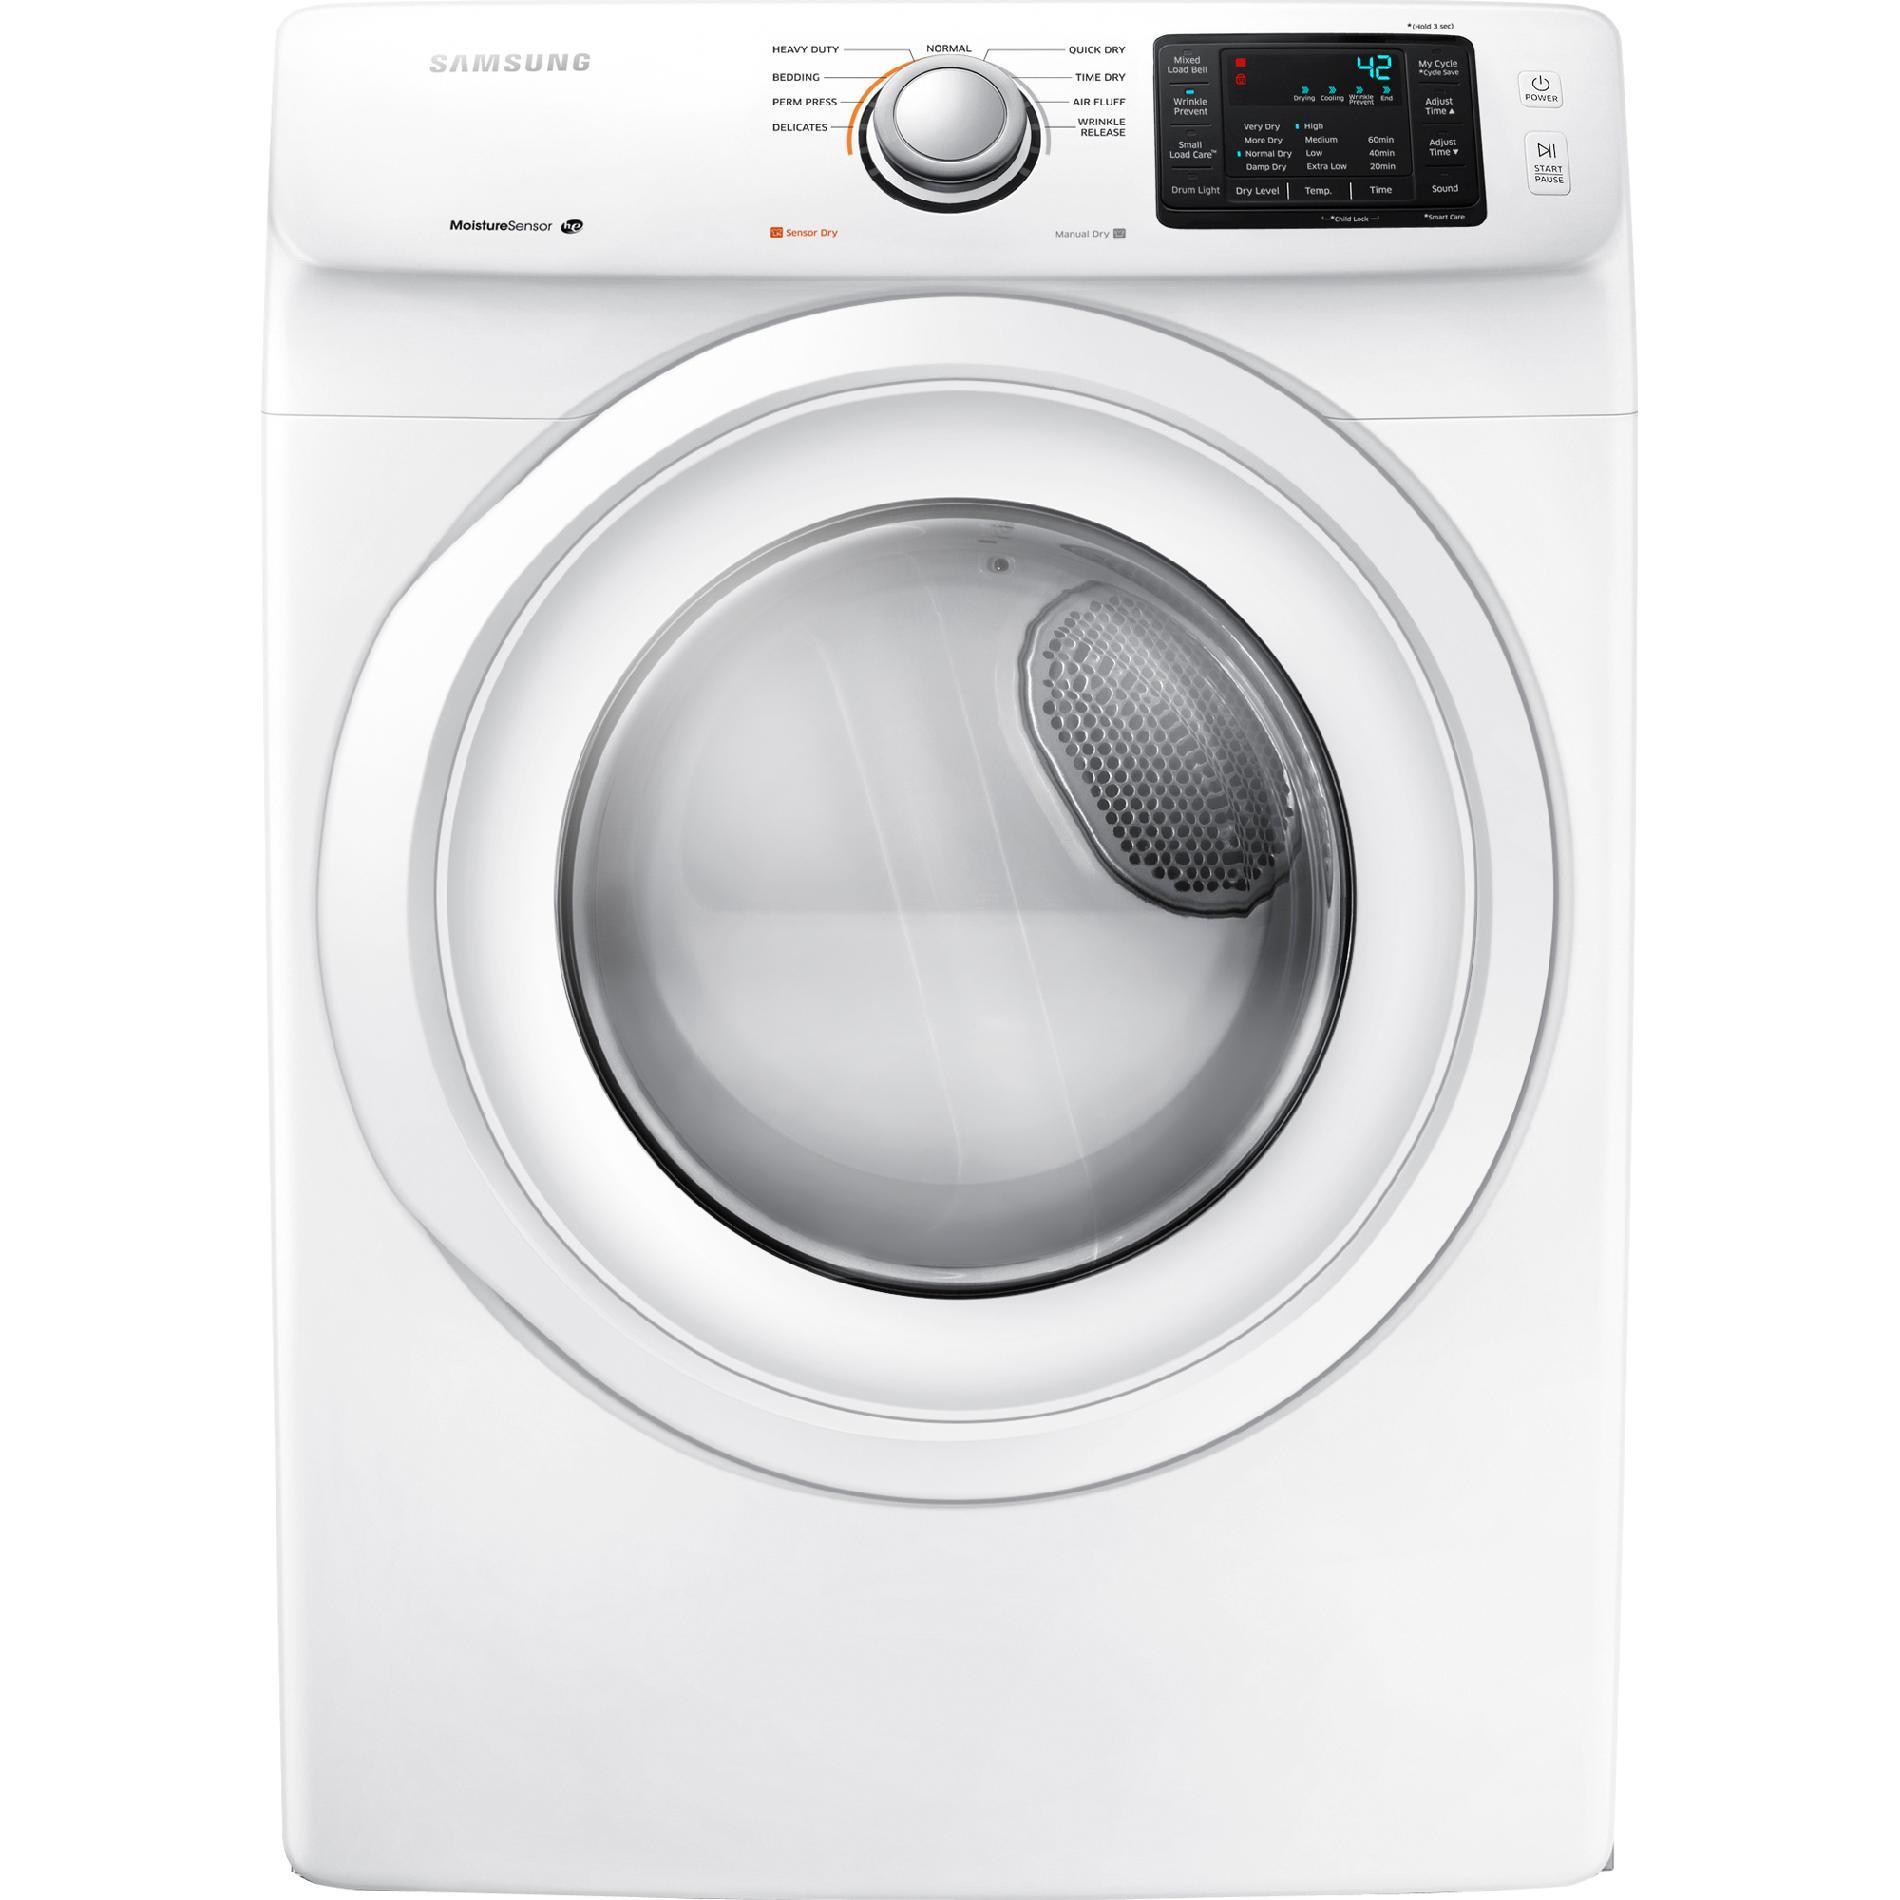 Samsung DV42H5000GW 7.5 cu. ft. Gas Dryer - White